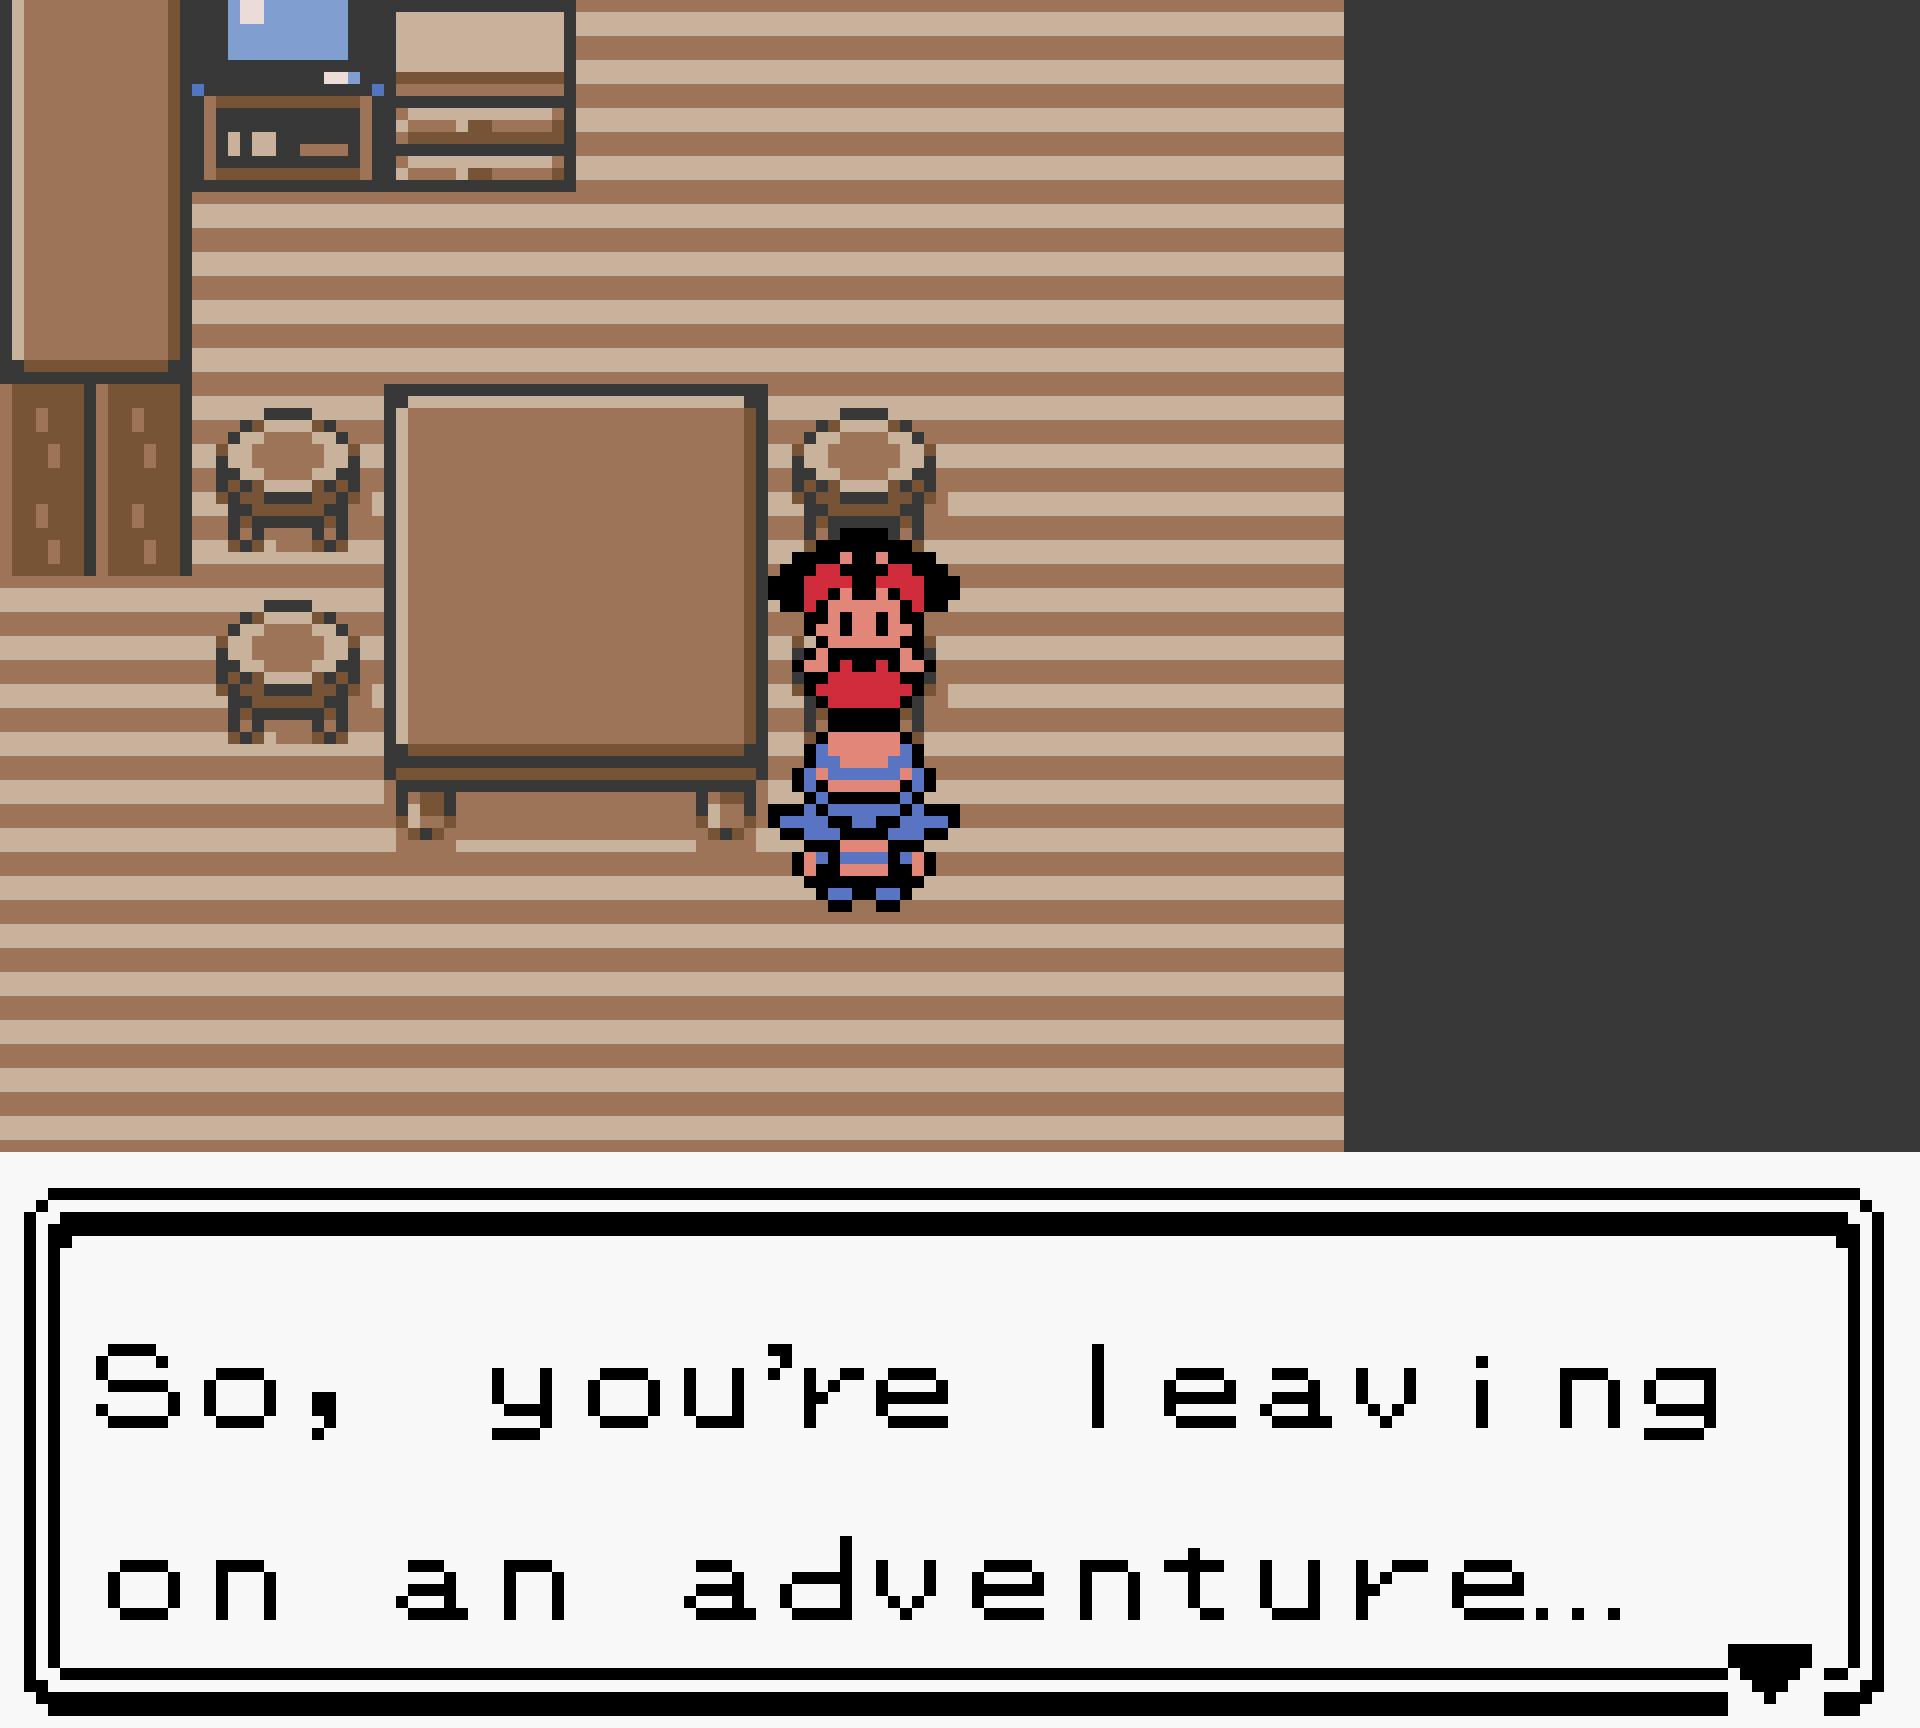 Pokemon_Crystal_Nuzlocke_2021-10-14_16.35.39.png